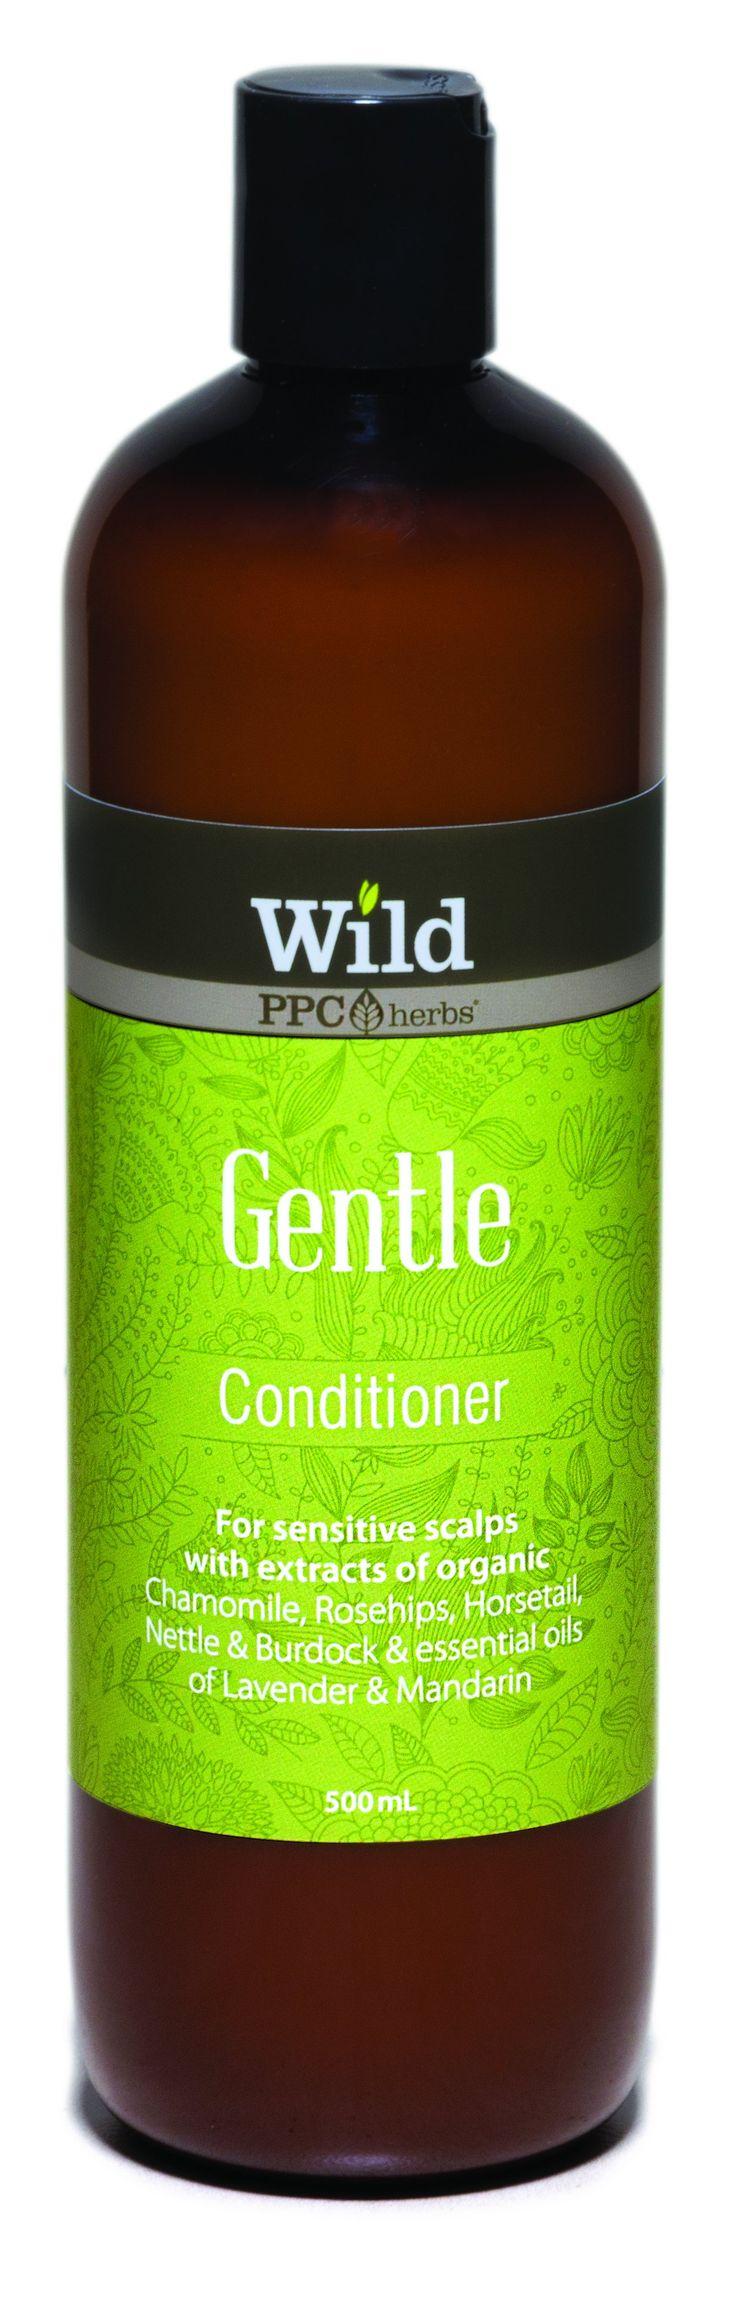 Wild PPC | Gentle Hair Conditioner for Sensitive Scalp- 500ml